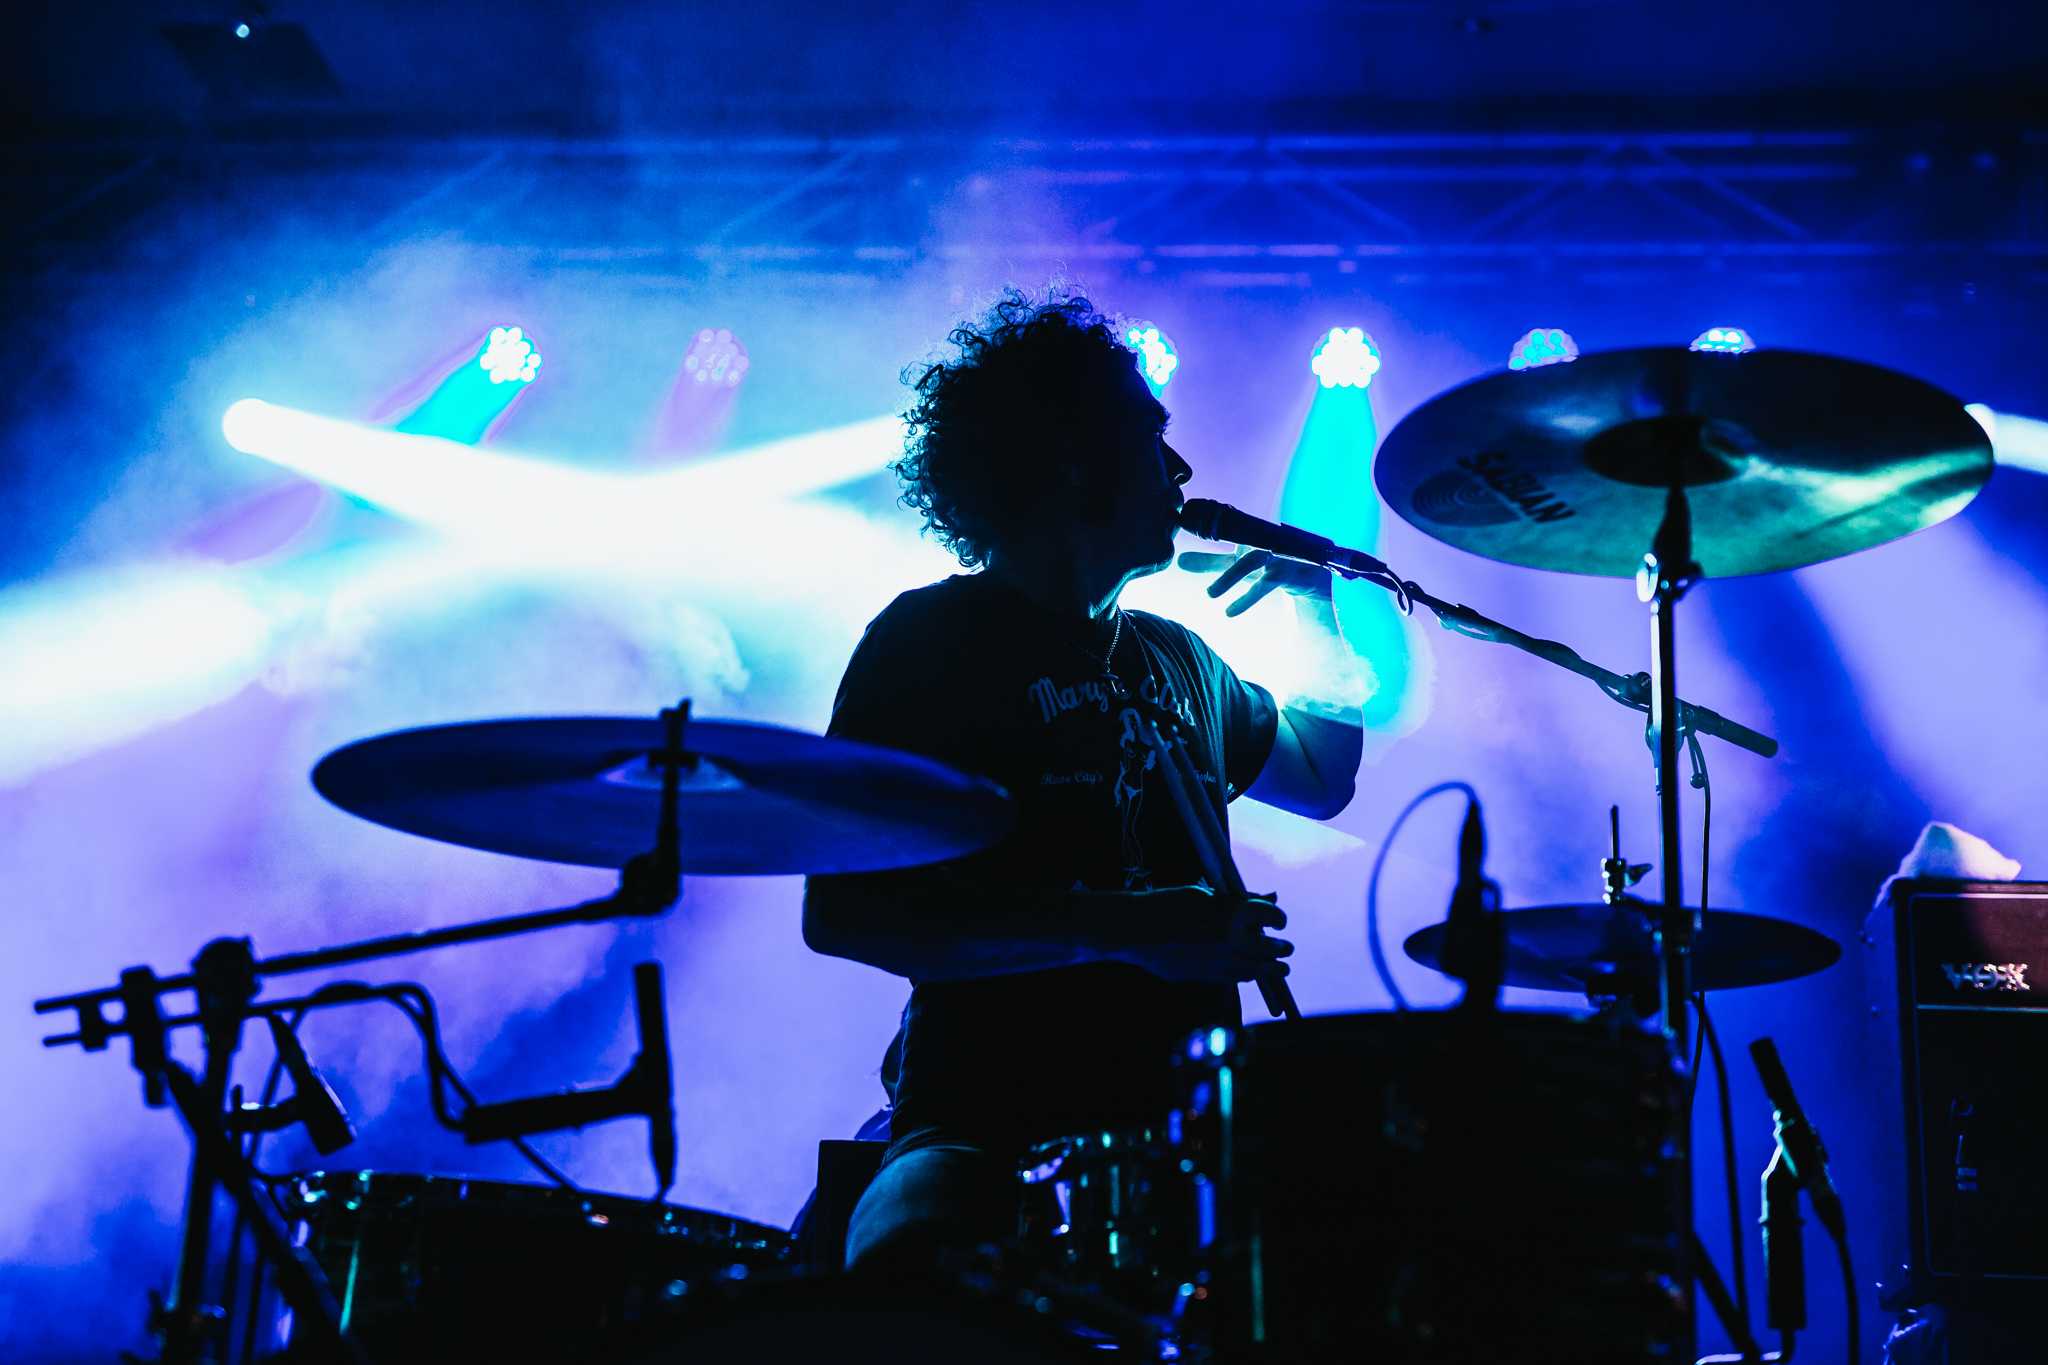 Mitch Lowe Photo - The Dandy Warhols-5386.jpg